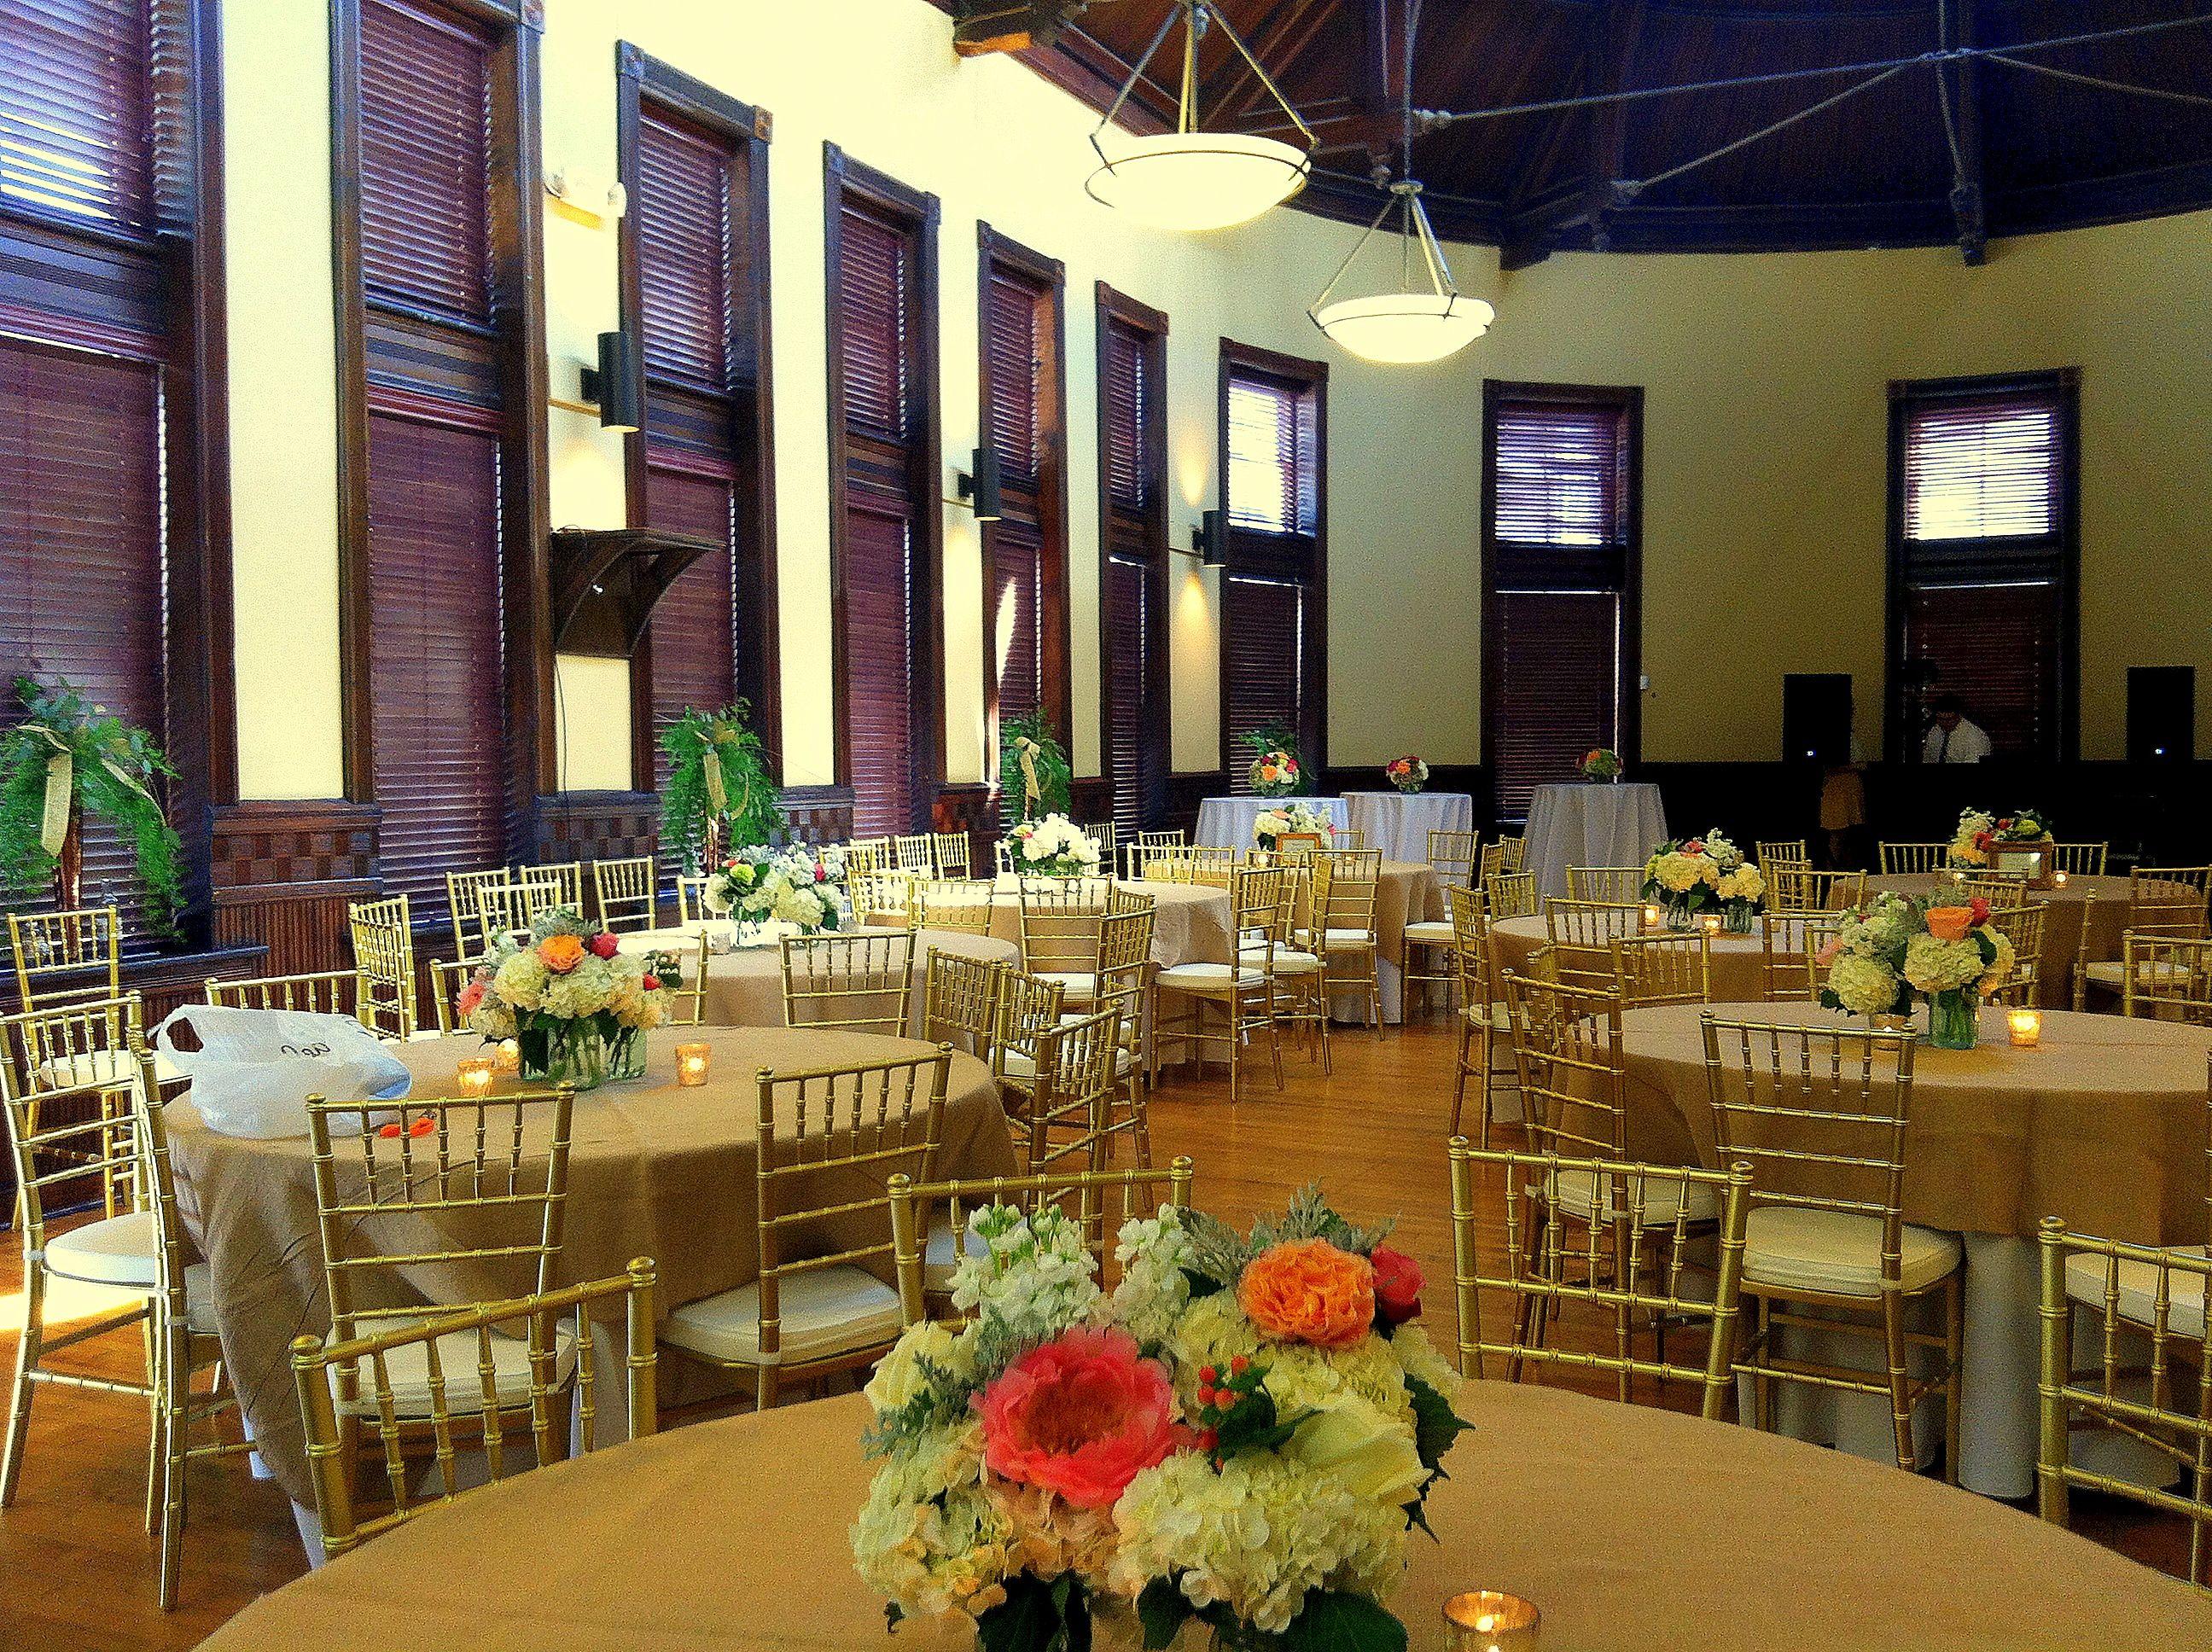 1889 Rustic Georgia Wedding Venue In Historic Downtown Macon